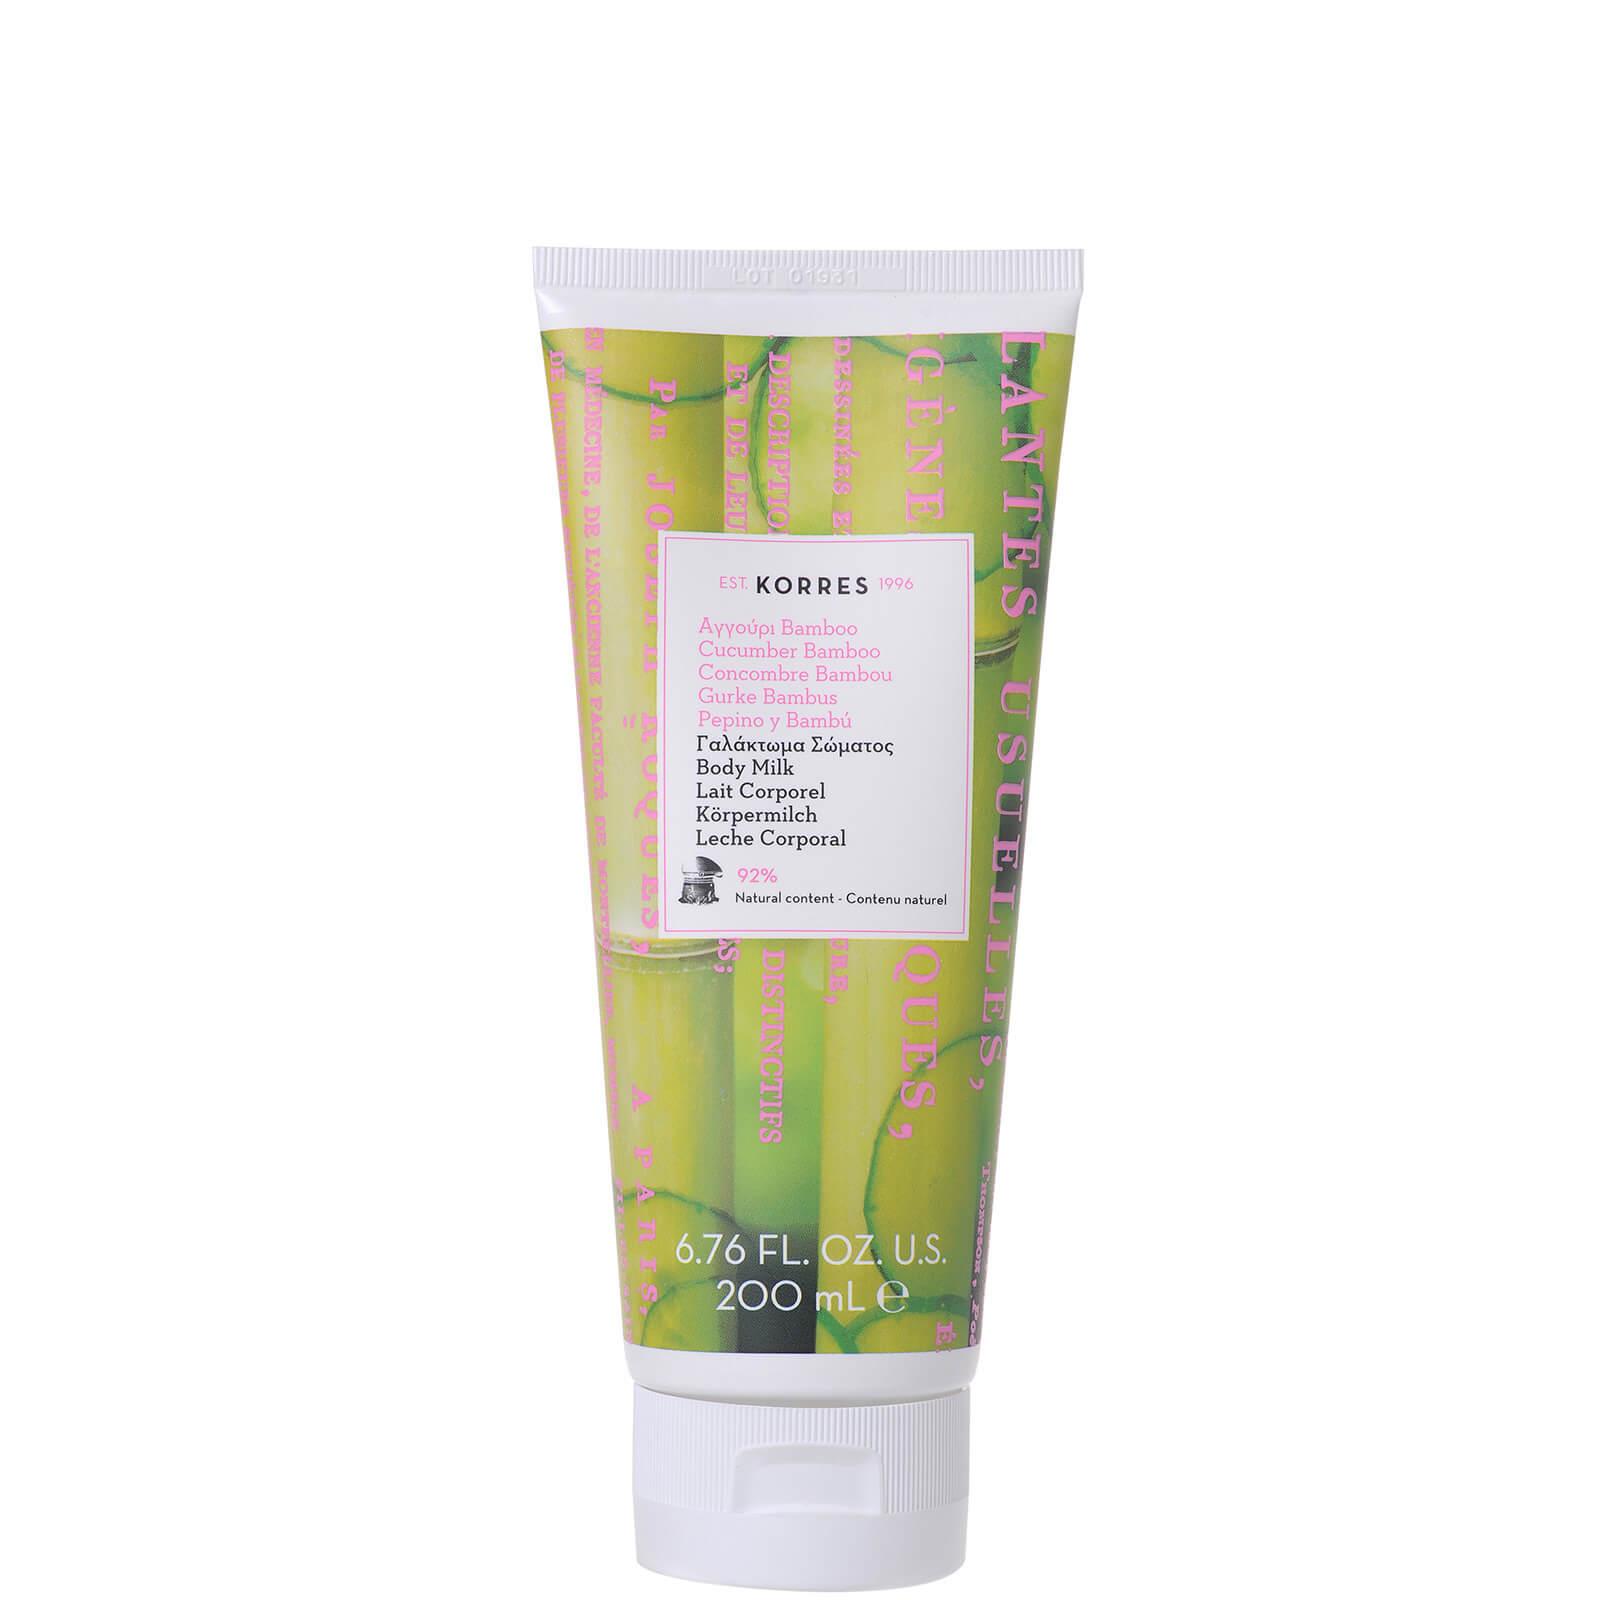 Купить KORRES Cucumber Bamboo Body Smoothing Milk 200ml